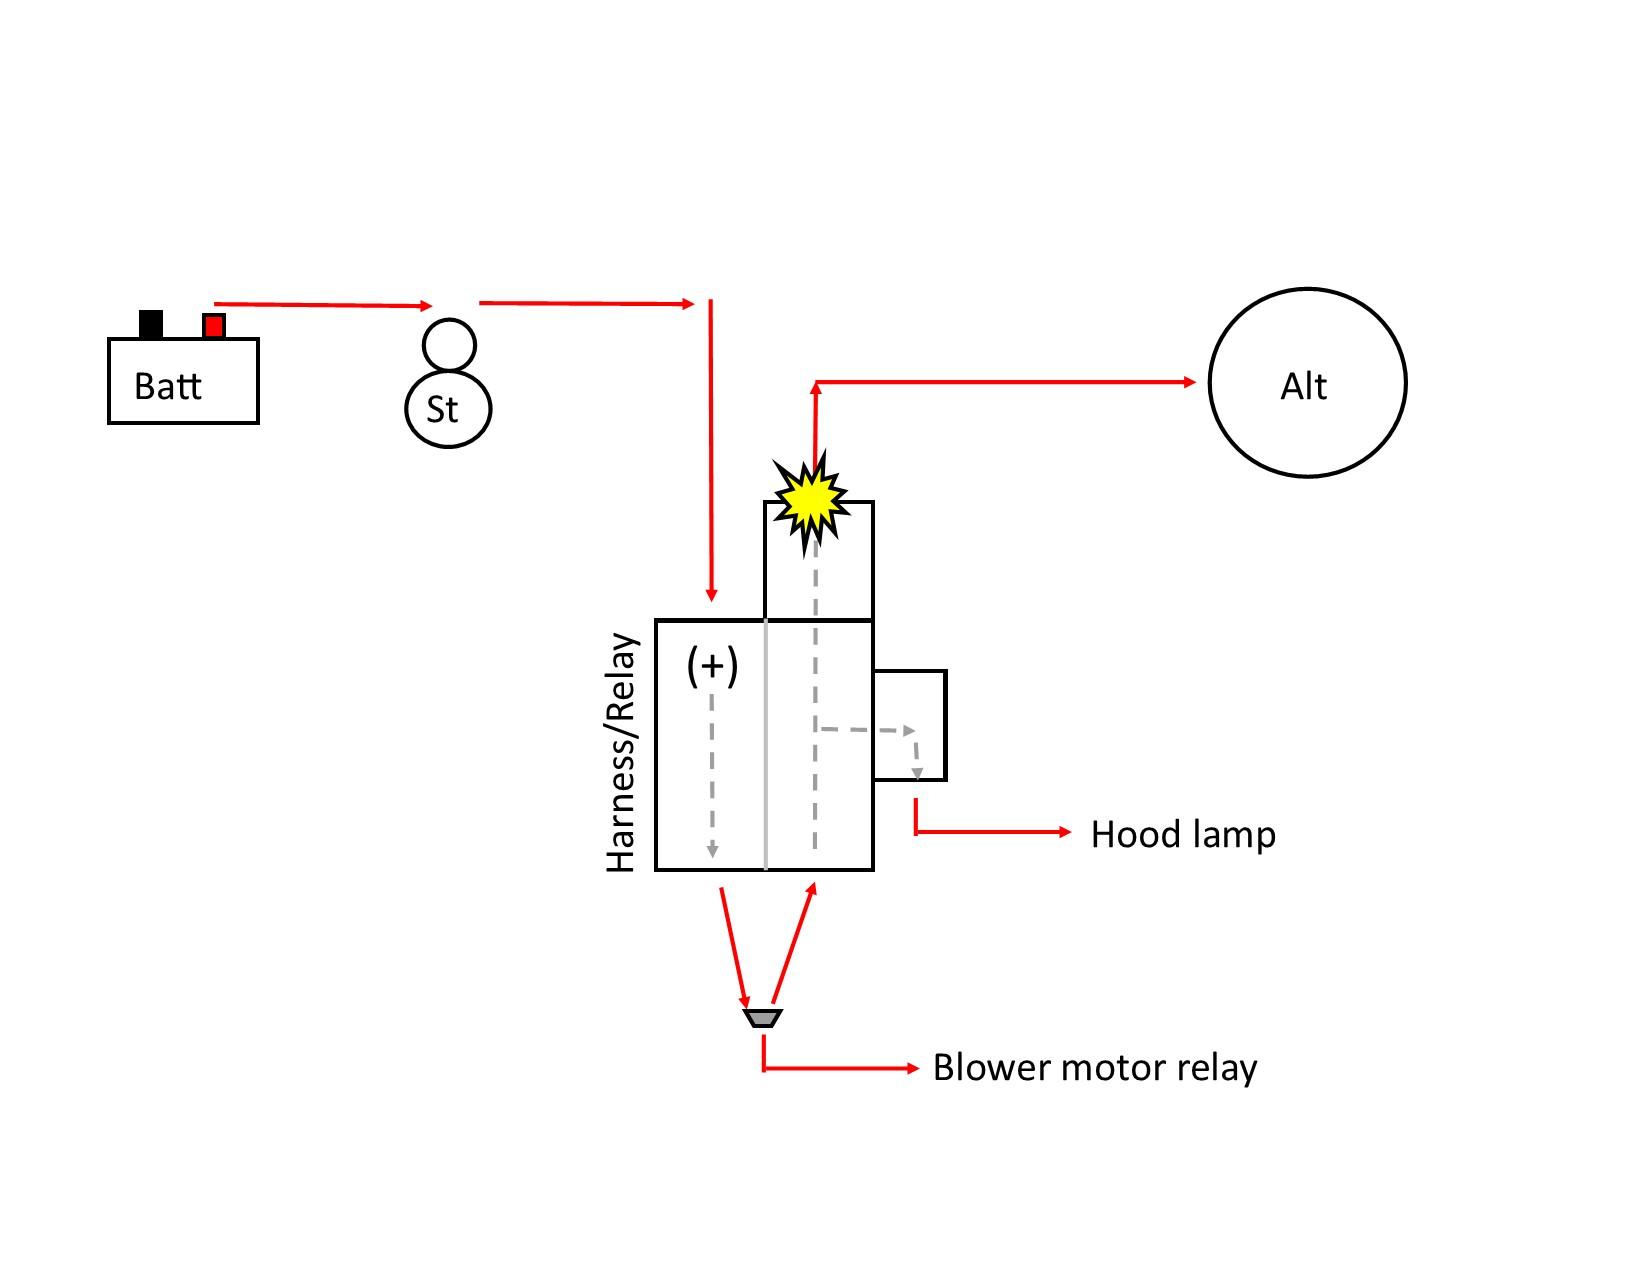 Dead Electrical After Shorting Alternator